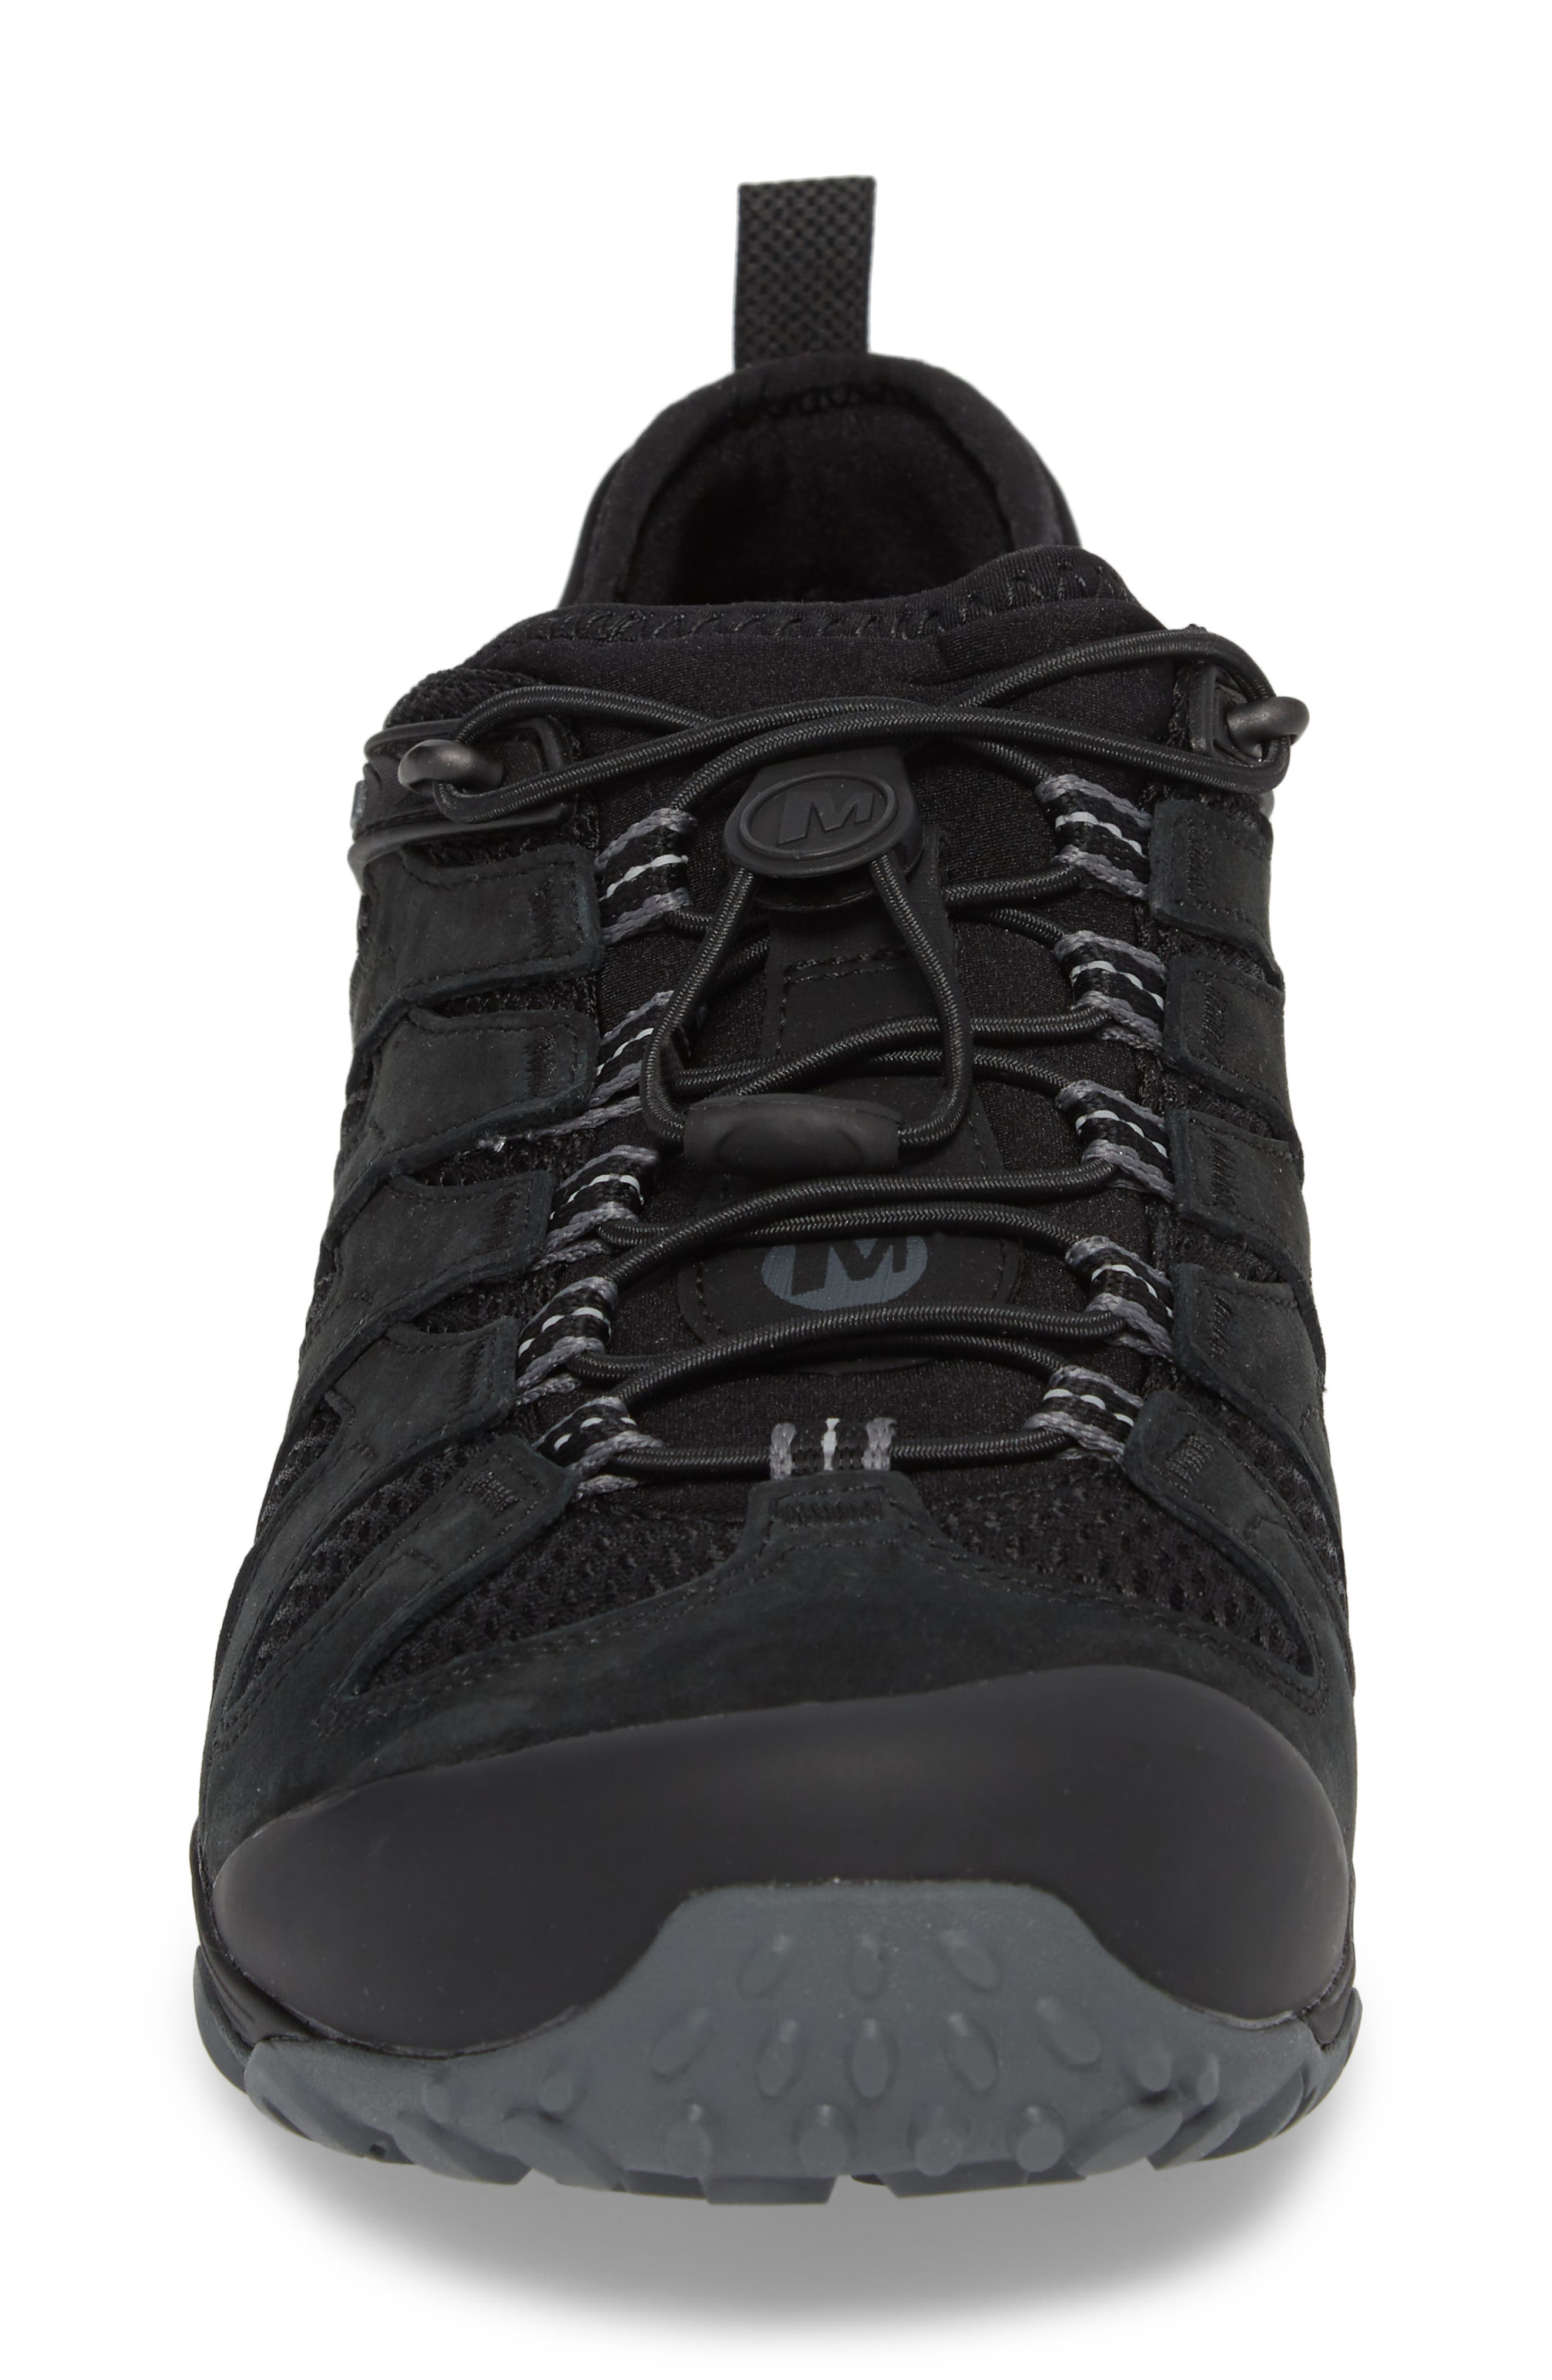 Chameleon 7 Stretch Hiking Shoe,                             Alternate thumbnail 4, color,                             Black